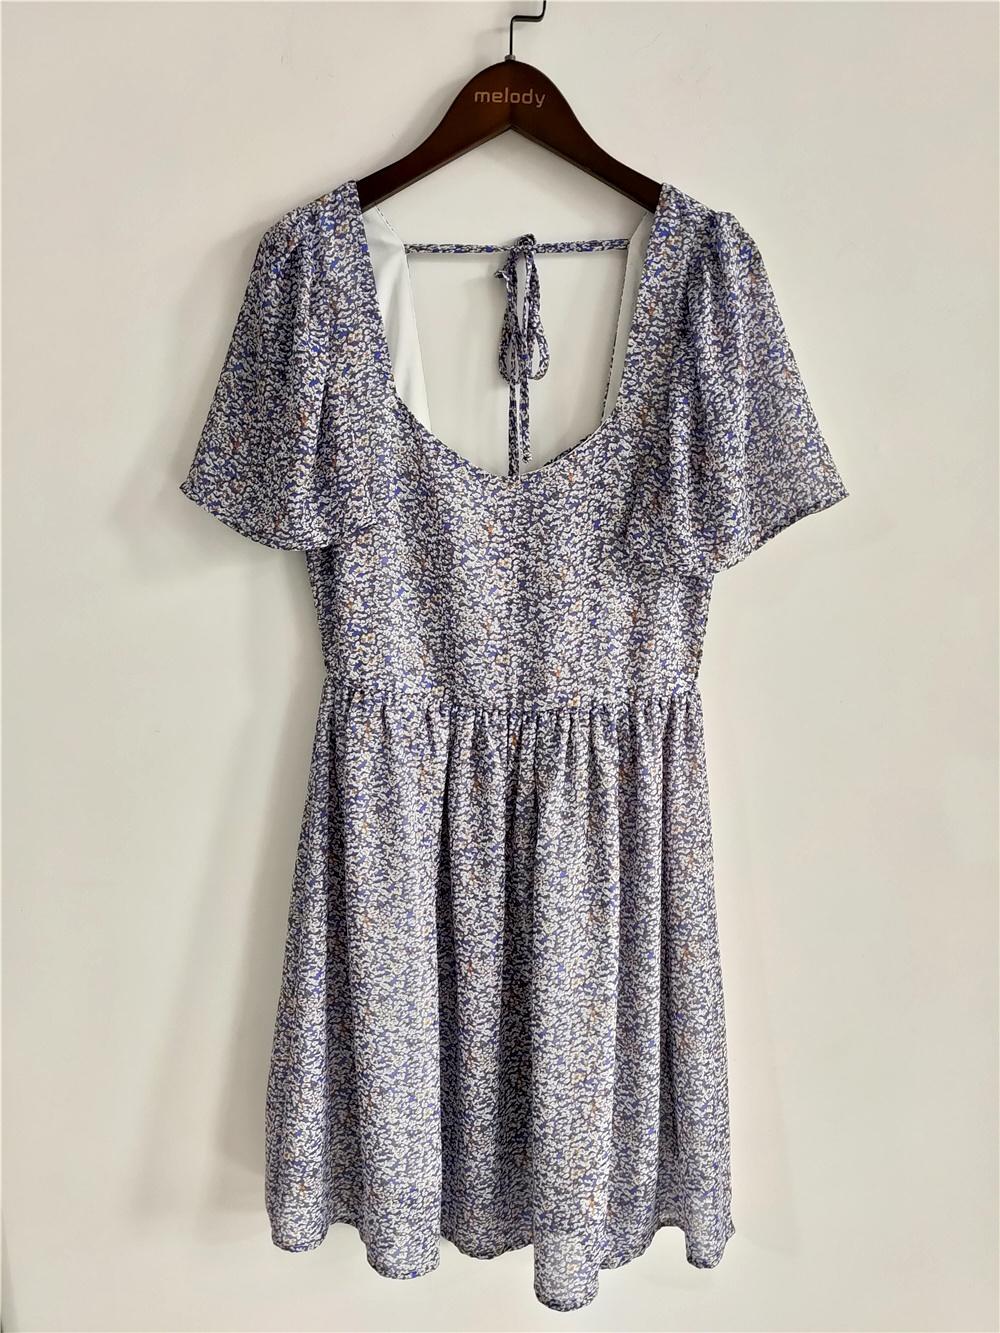 Ladies Sweet Floral Dress With Short Sleeves